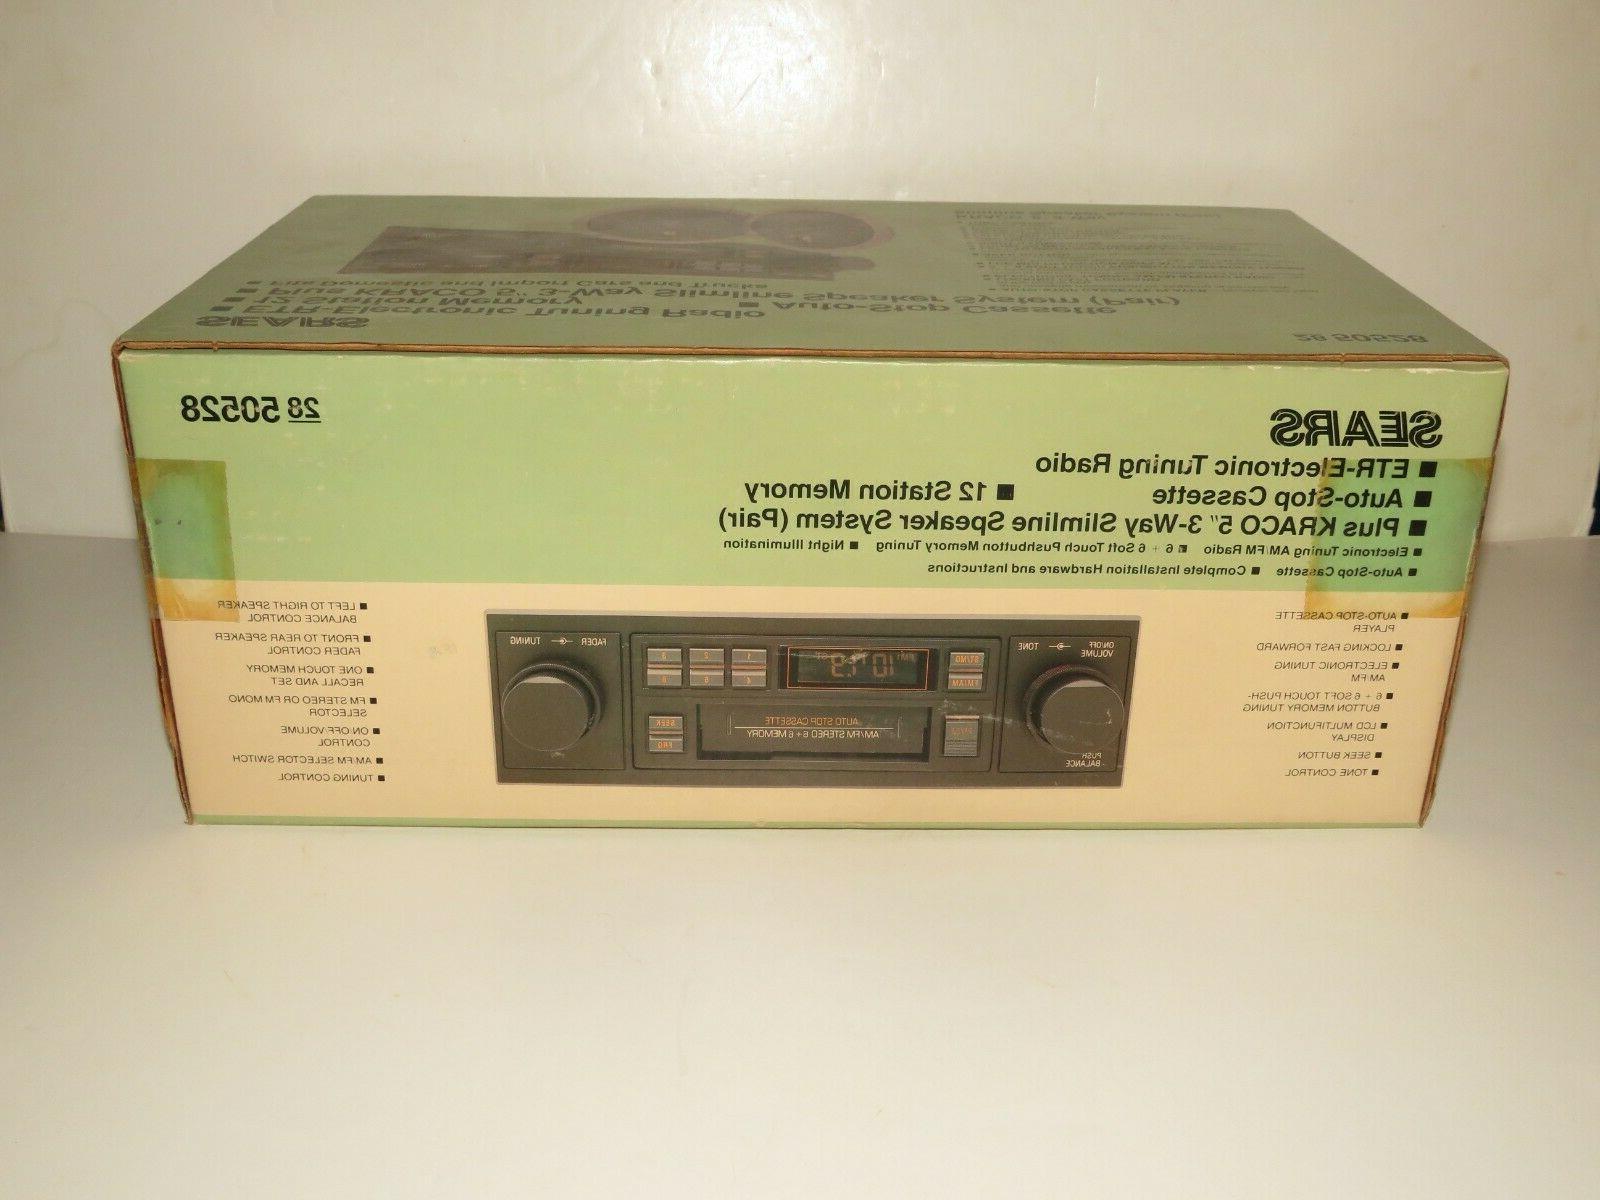 SEARS Cassette Car Stereo Kraco Speakers Box